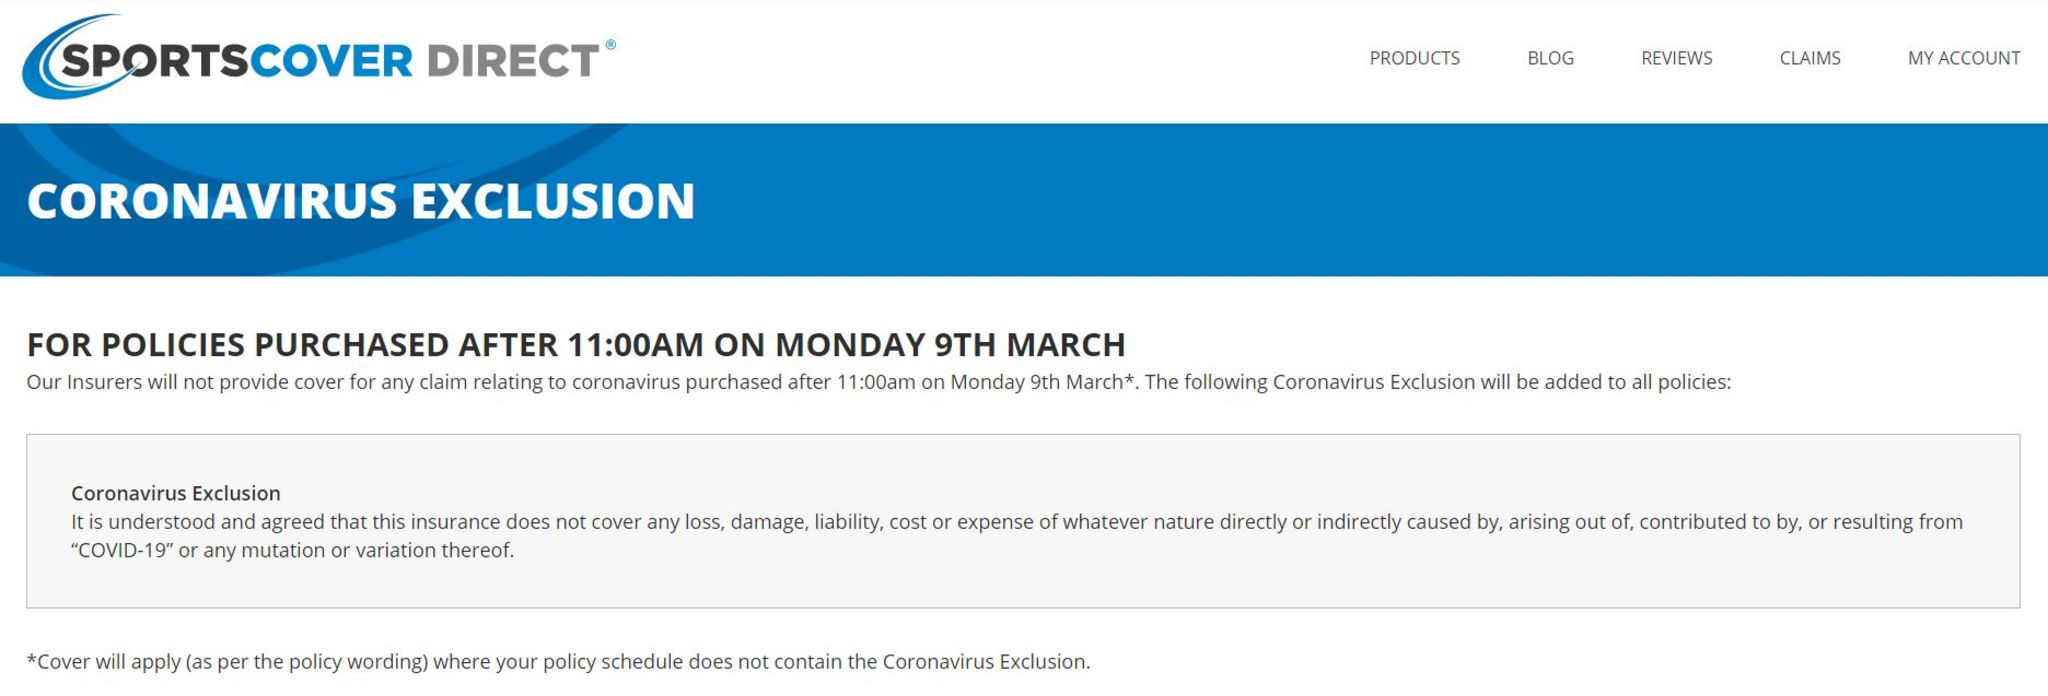 SportsCover Direct website notice